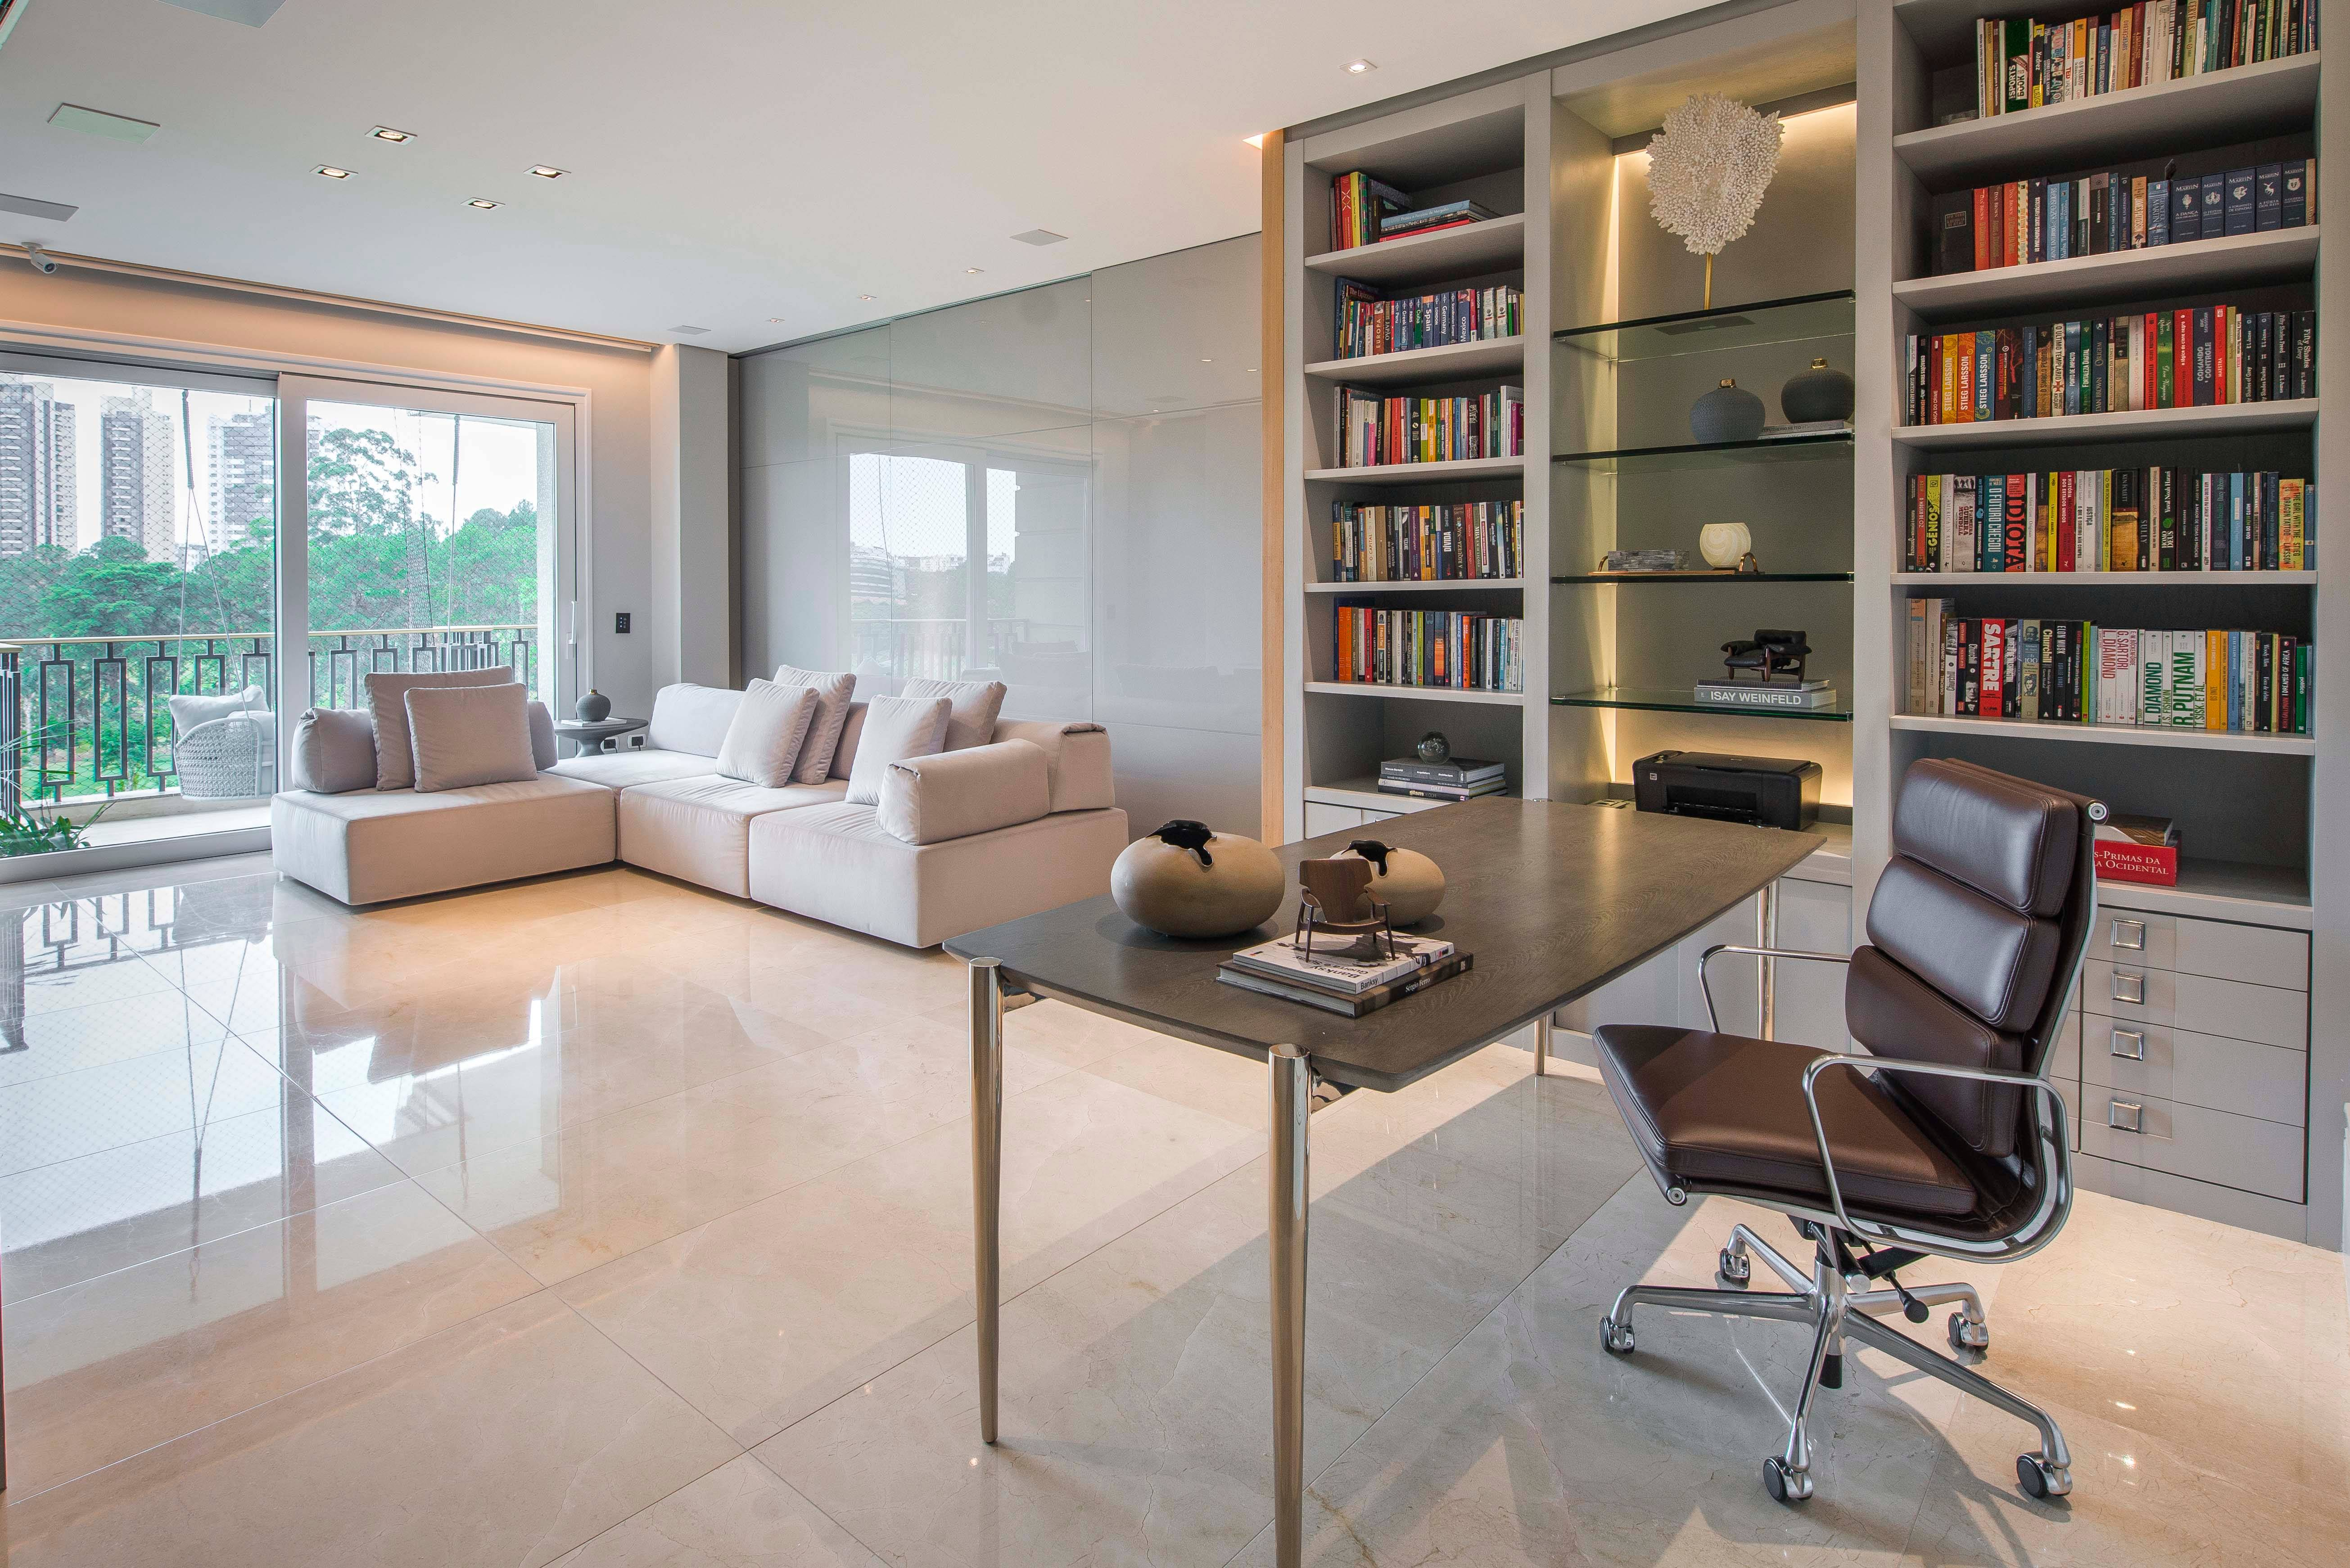 Projeto de apartamento de Curitiba por Sharise Gulin.